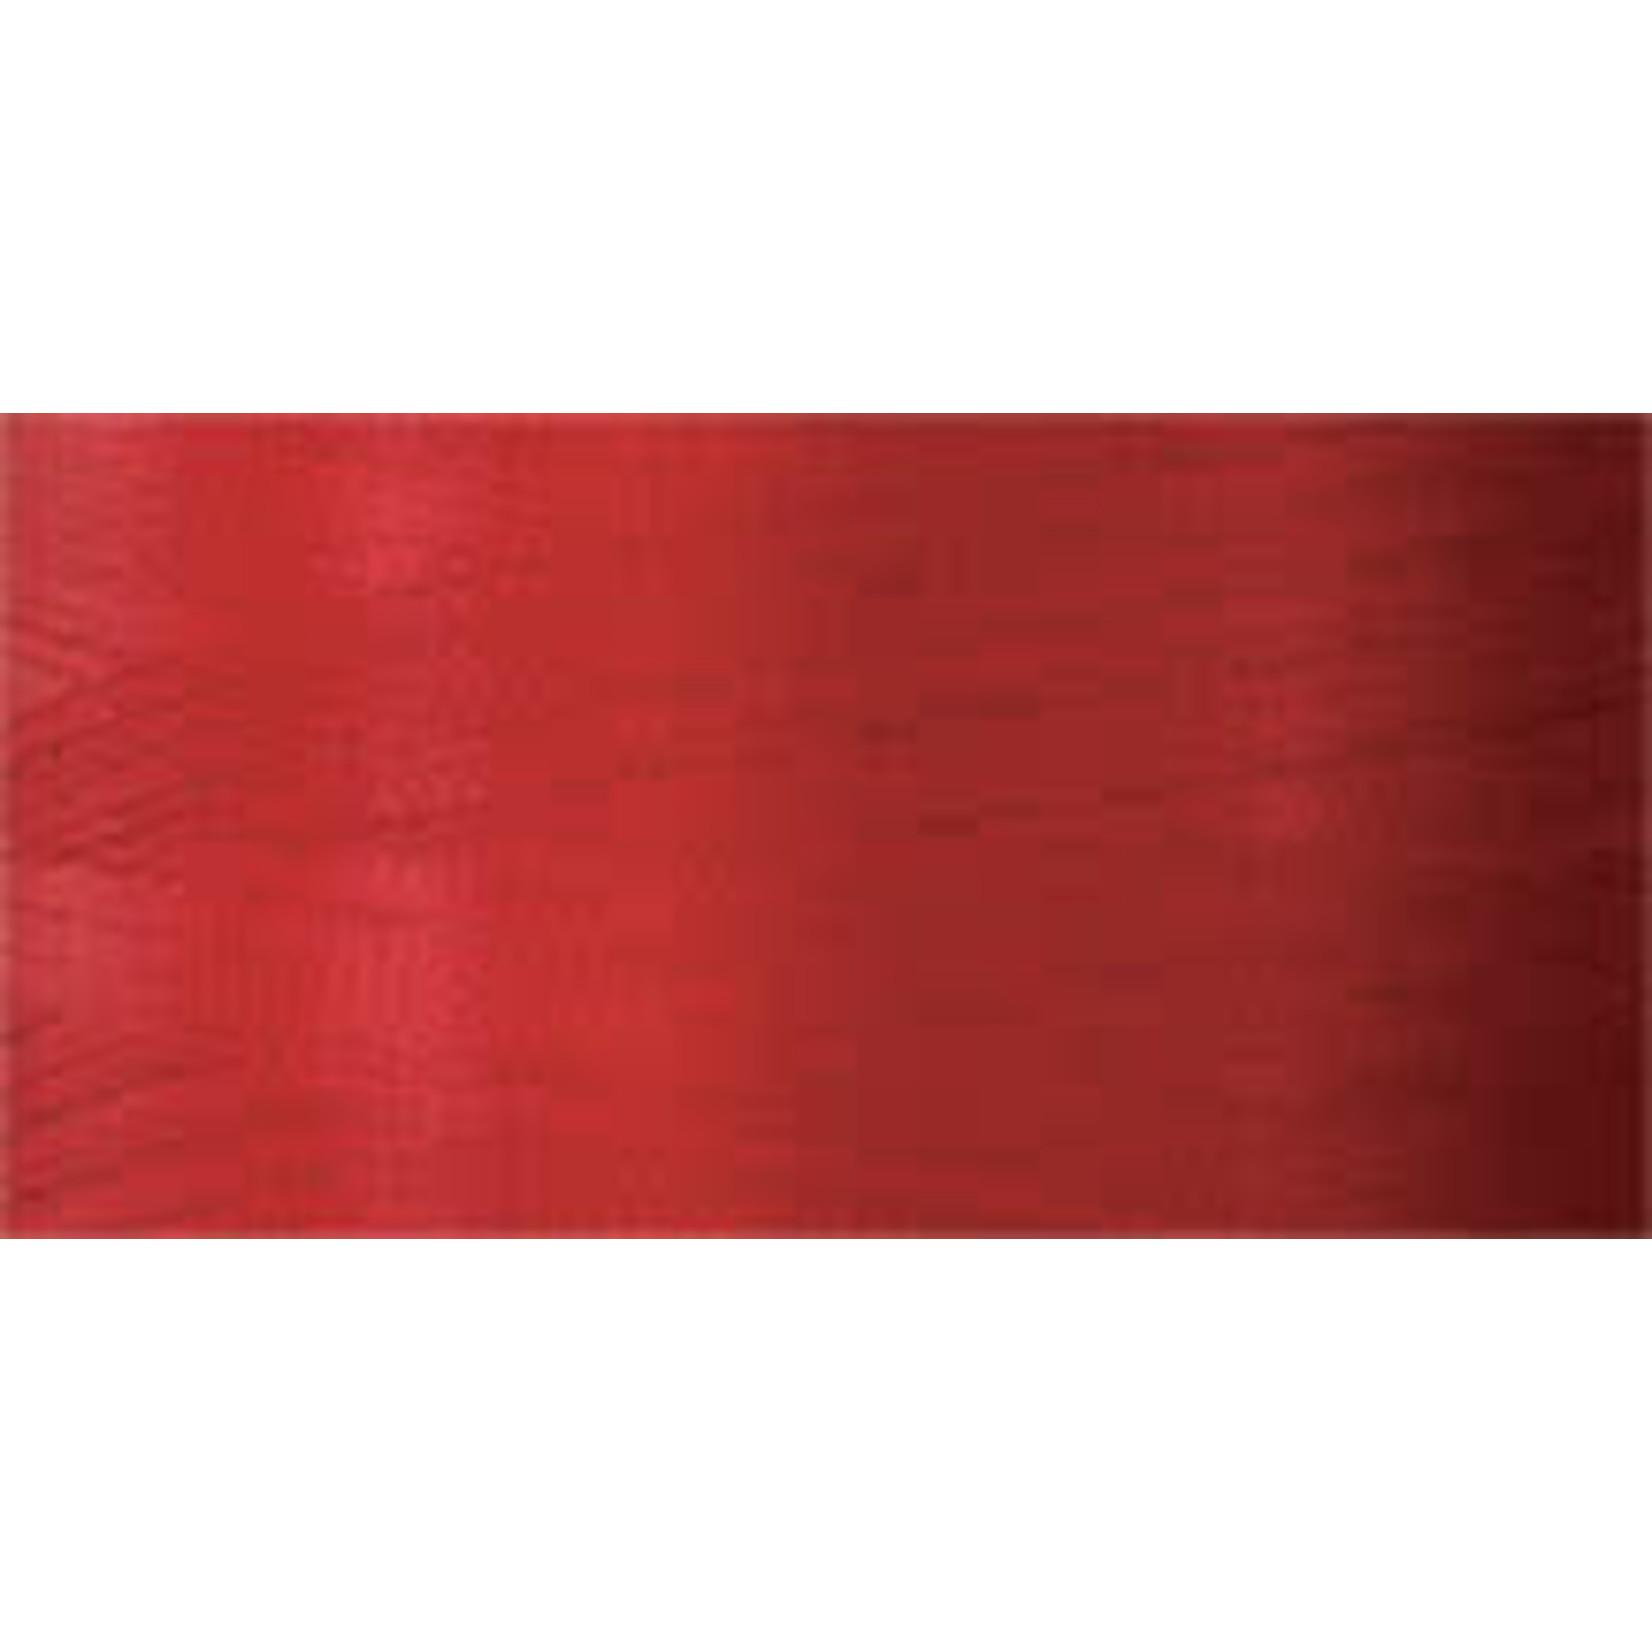 Superior Threads Bottom Line - #60 - 1300 m - 627 Bright Red